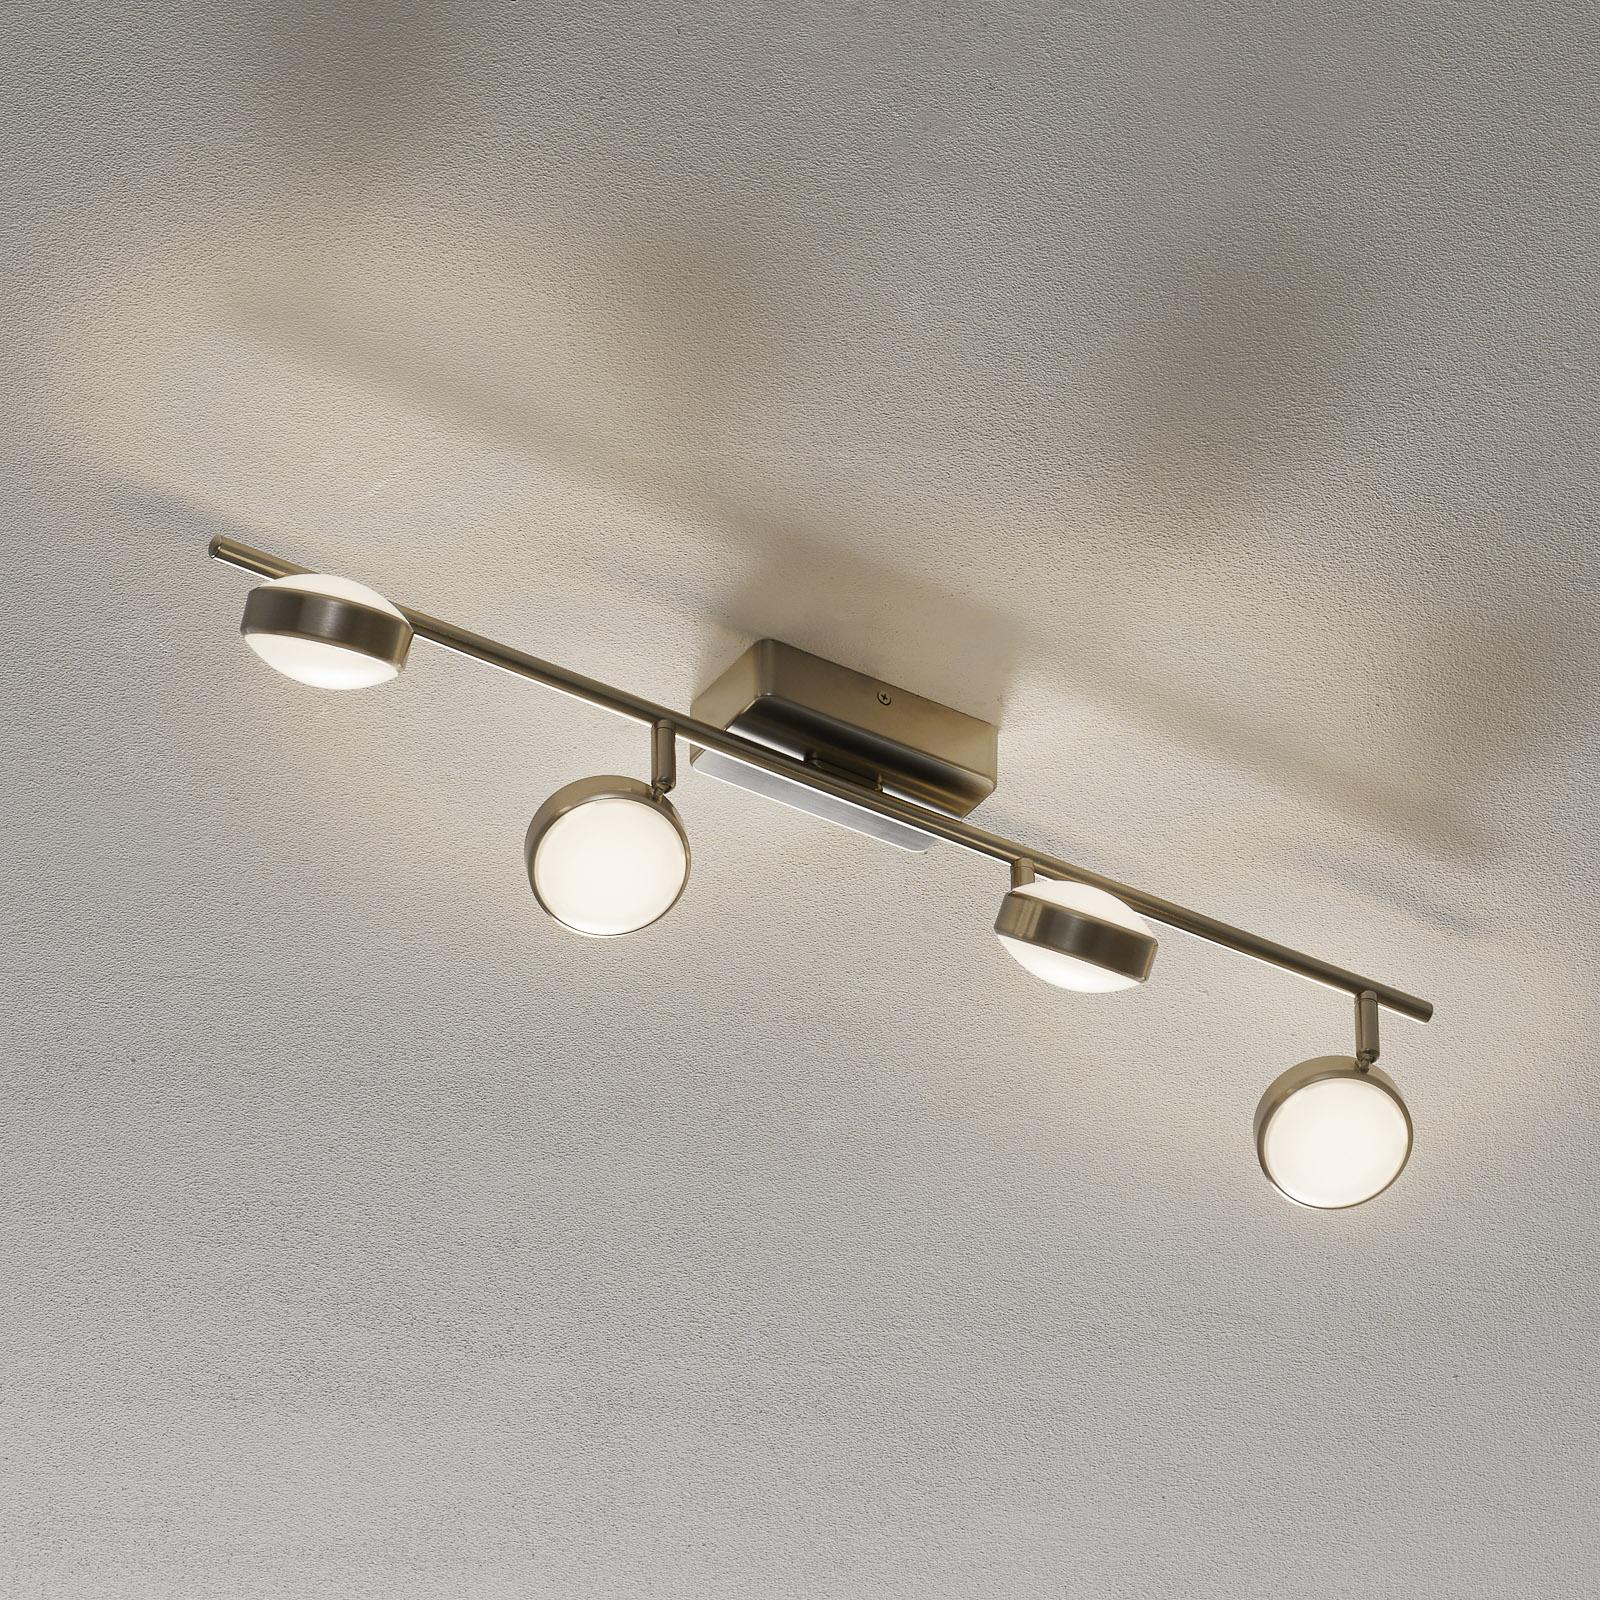 EGLO connect Corropoli-C LED-taklampe, 4 lyskilder